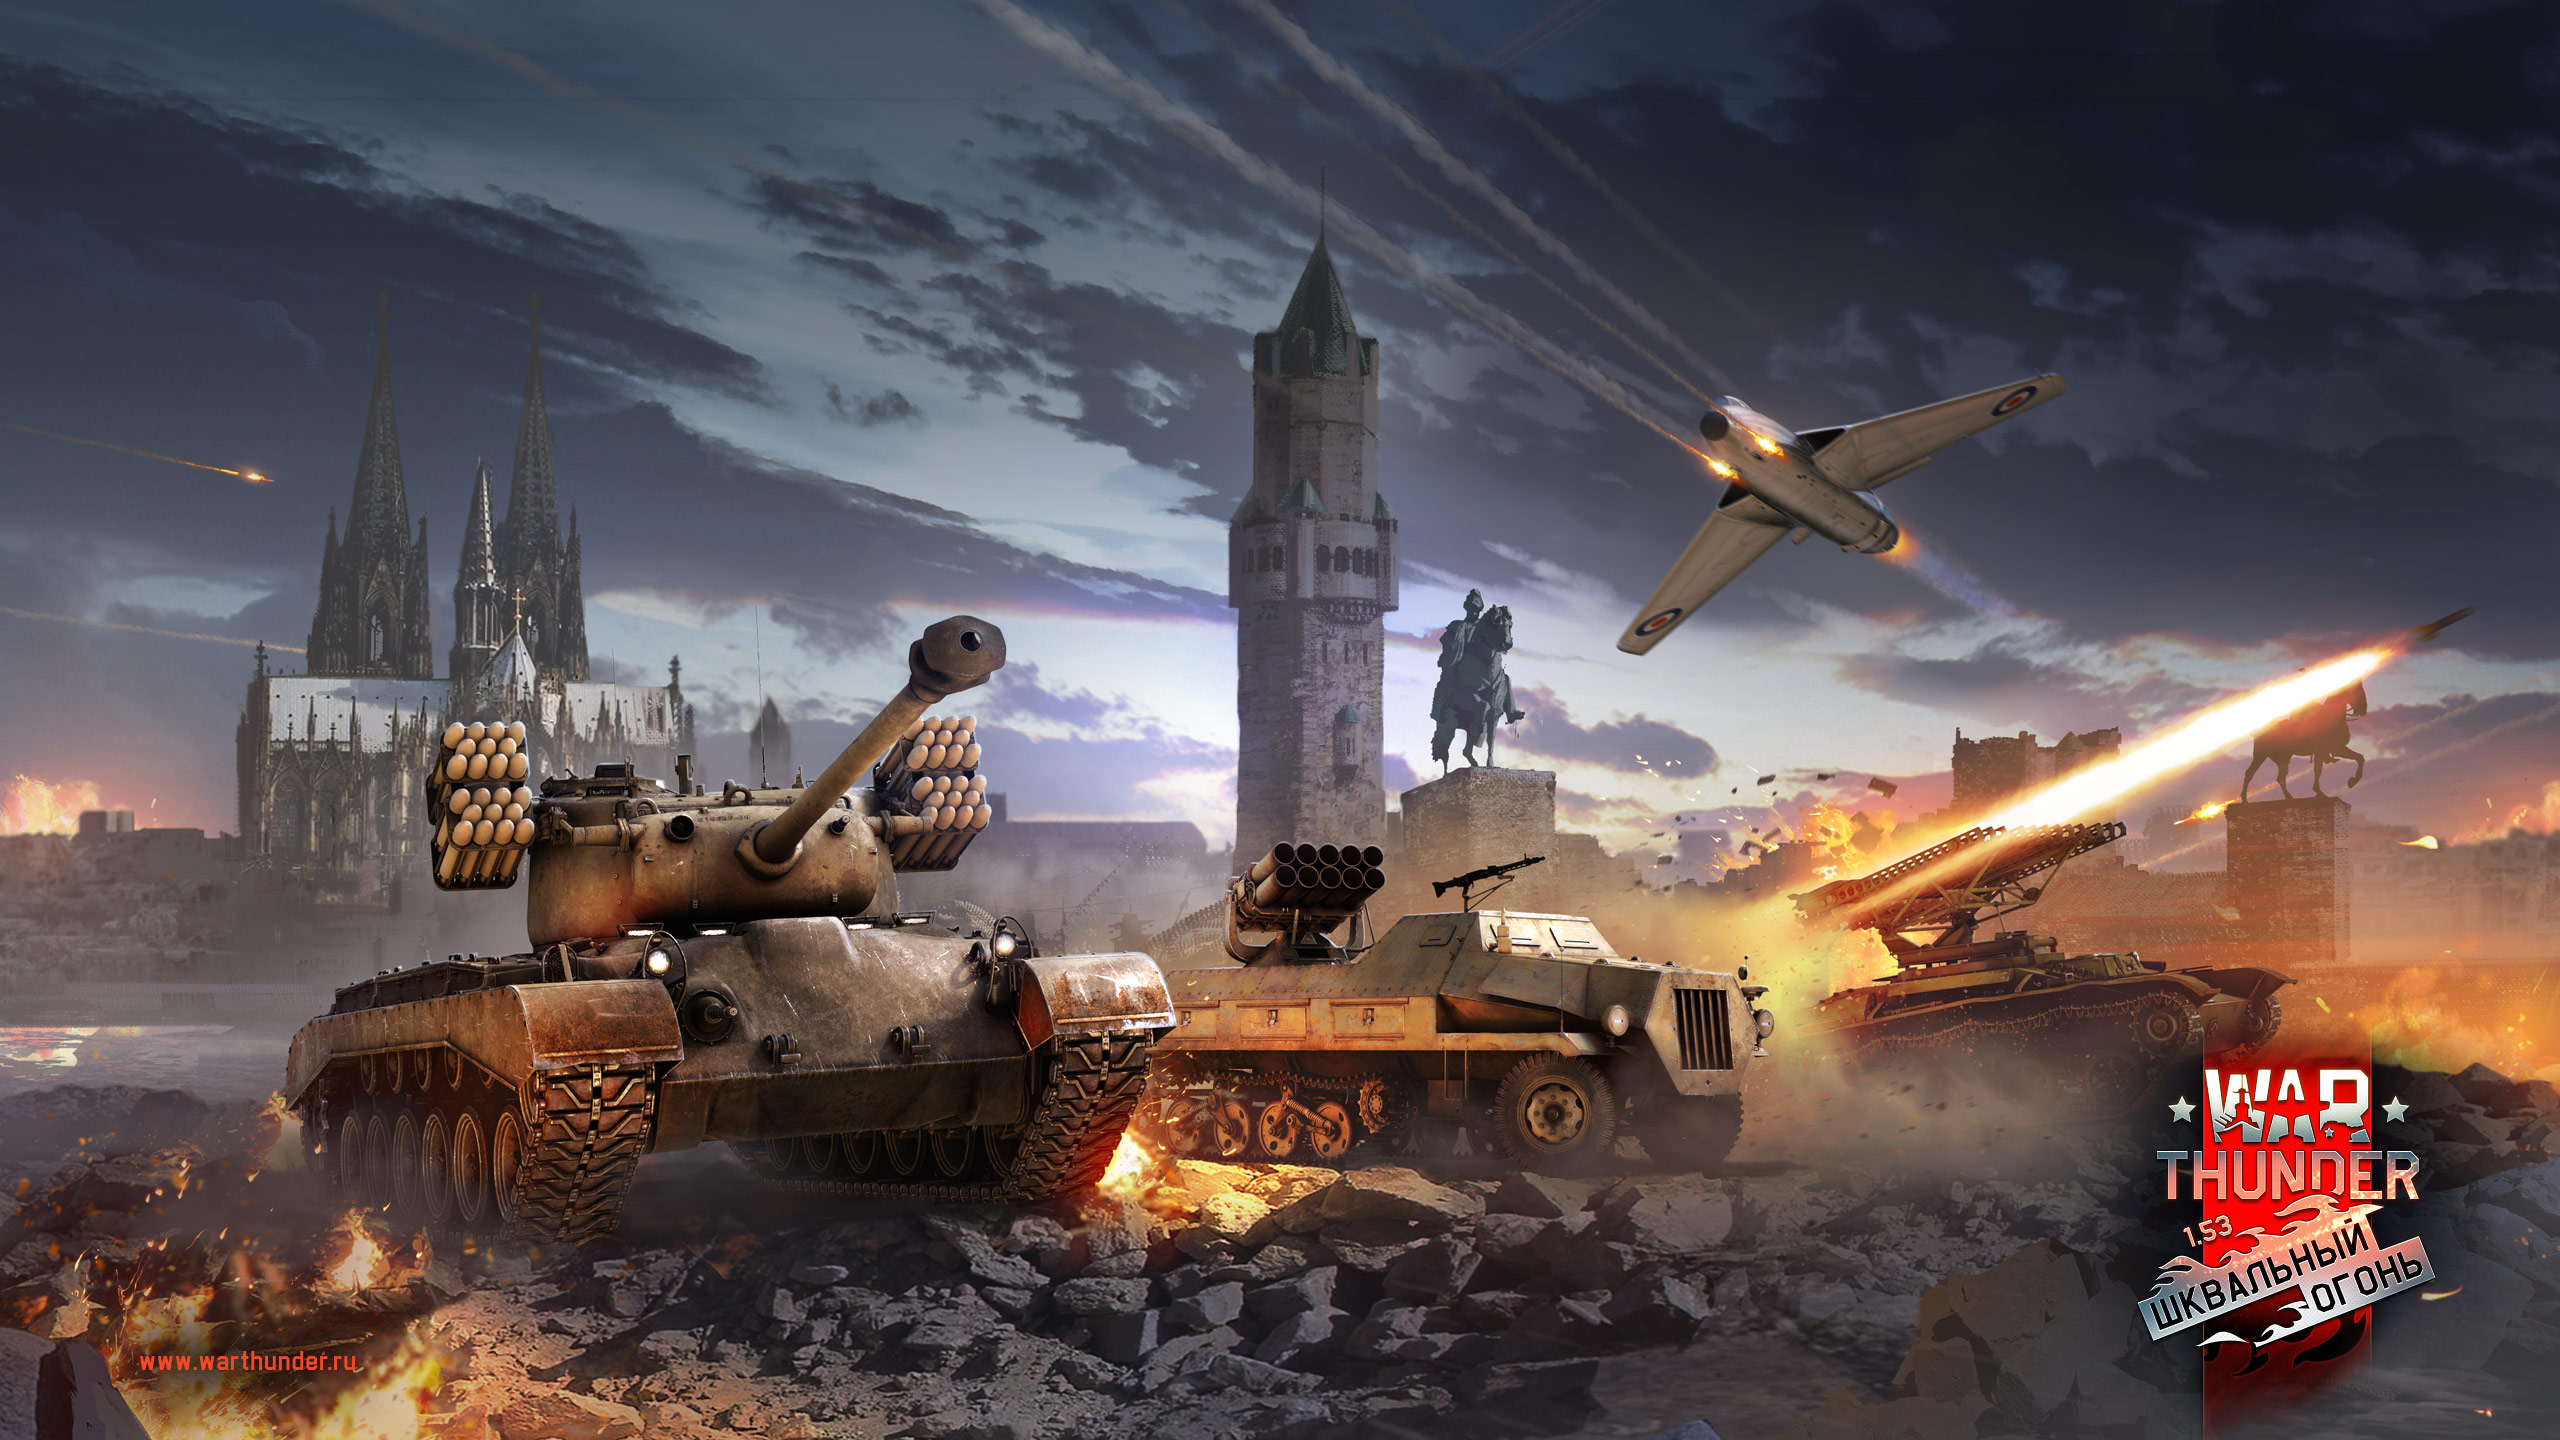 рисунок Wr Thunder реактивная артиллерия